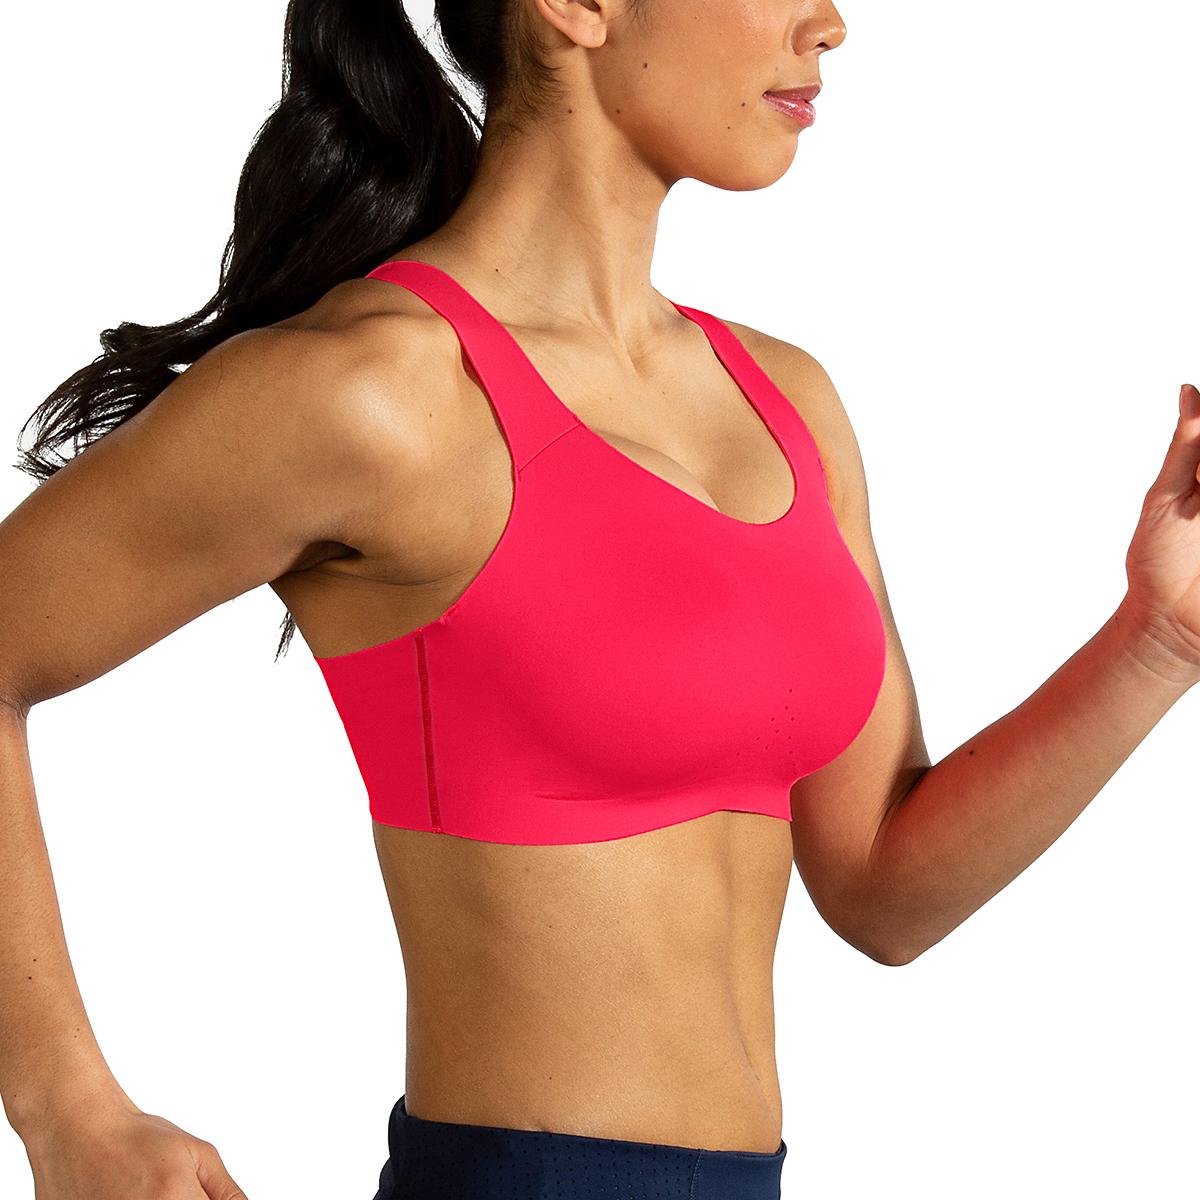 Women's Brooks Dare Scoopback Run Bra, , large, image 3